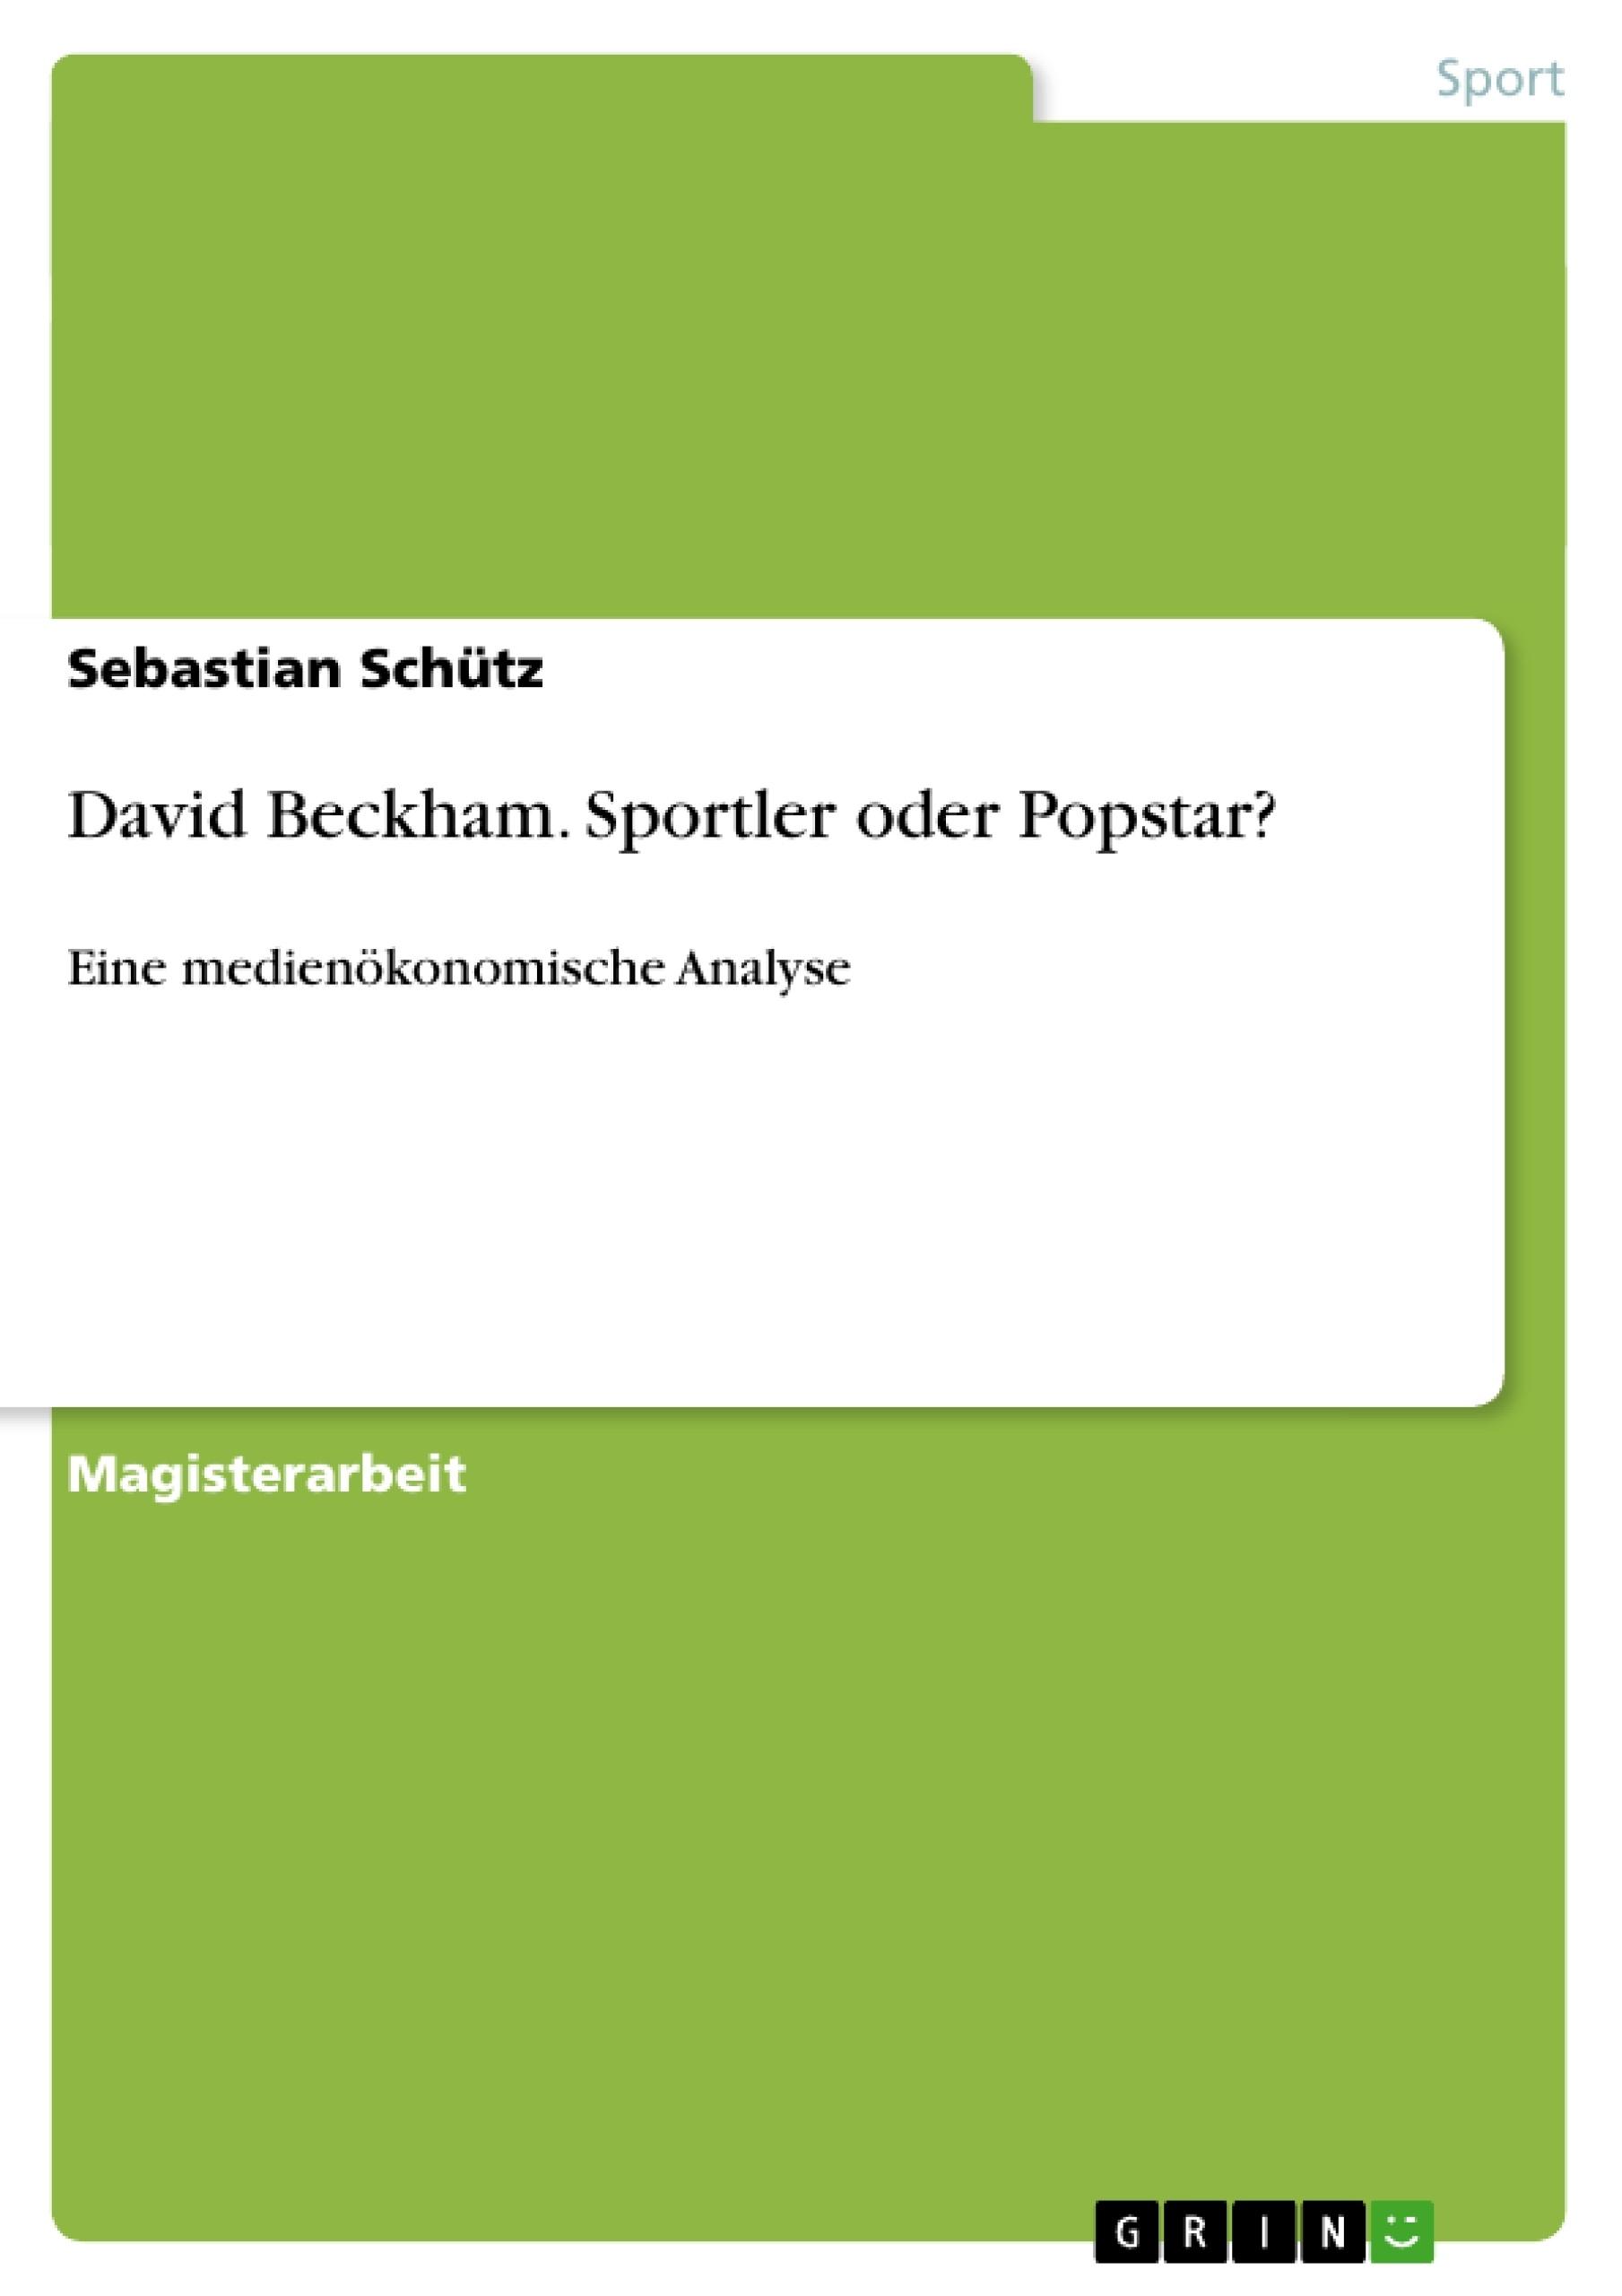 Titel: David Beckham. Sportler oder Popstar?